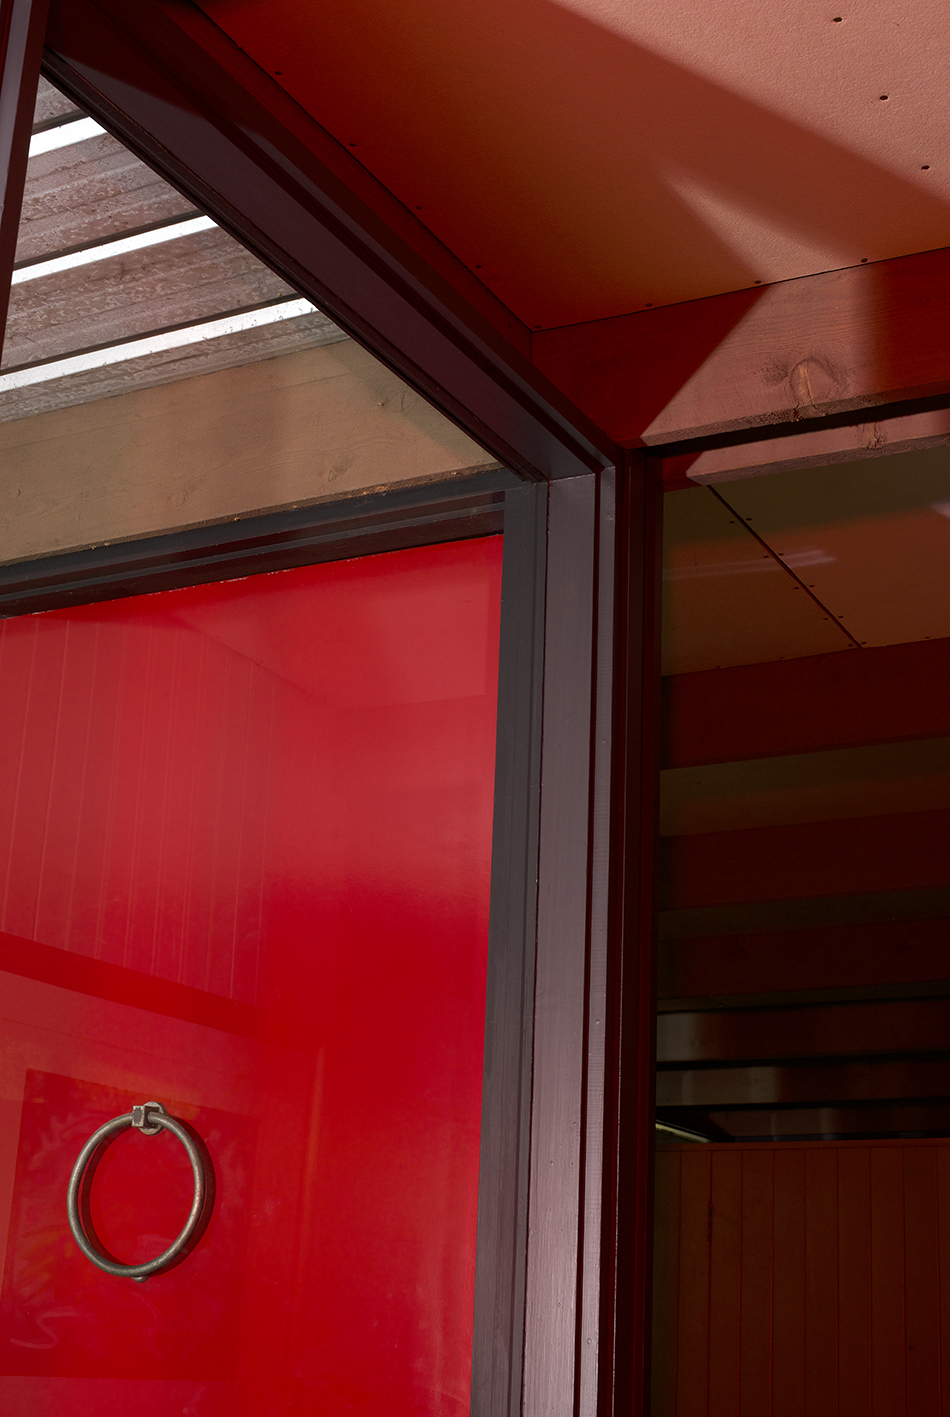 LYDIA WEGNER   Red Door  2019 Archival Inkjet Print 100 x 67 cm